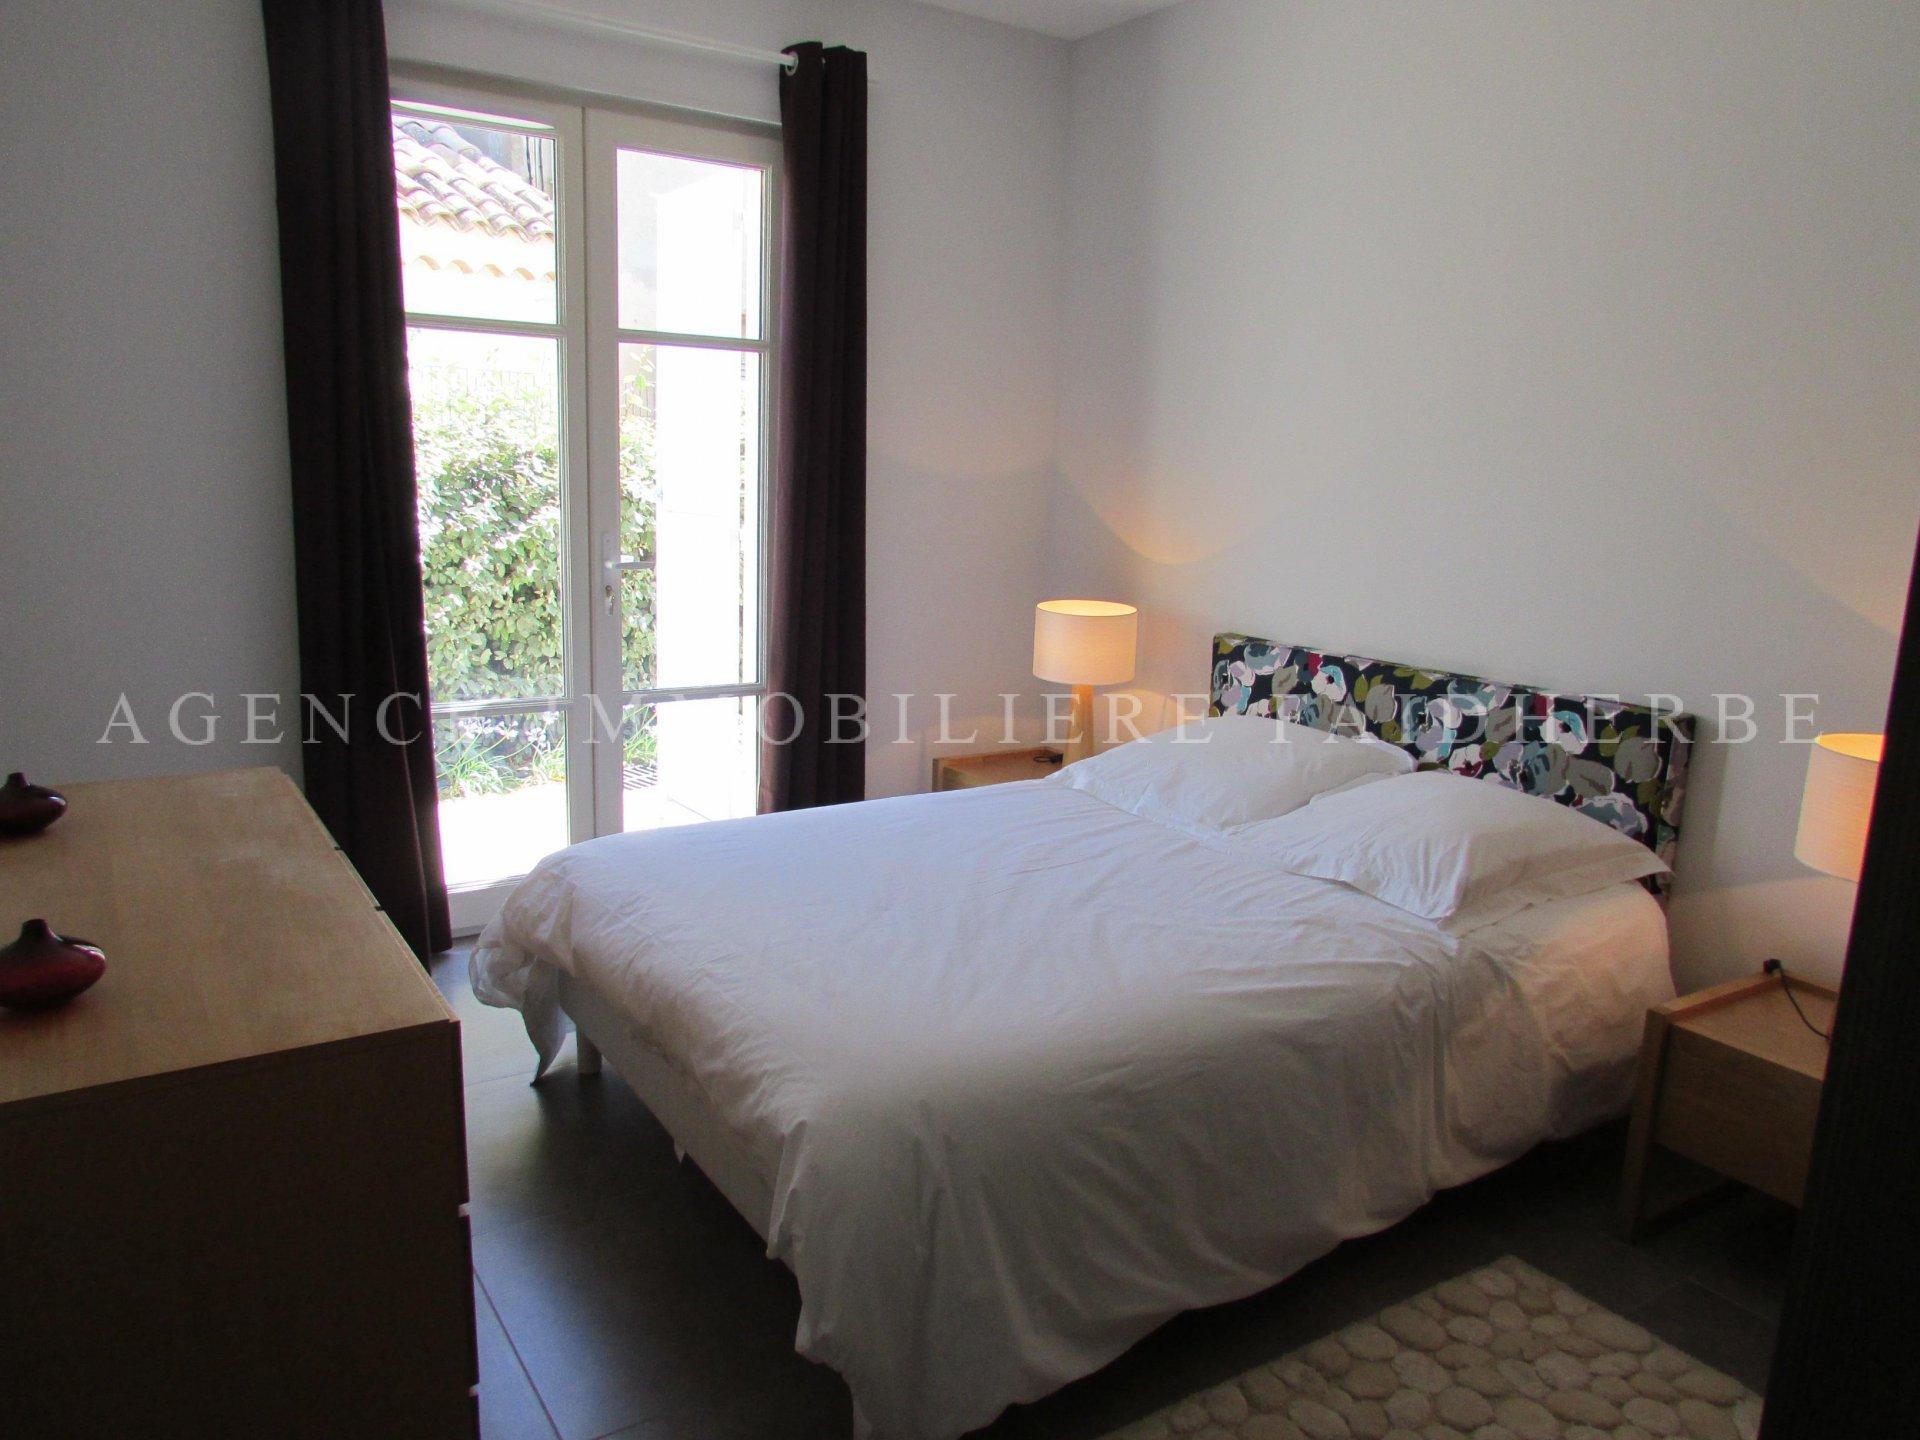 Affitto stagionale Appartamento - Saint-Tropez Centre